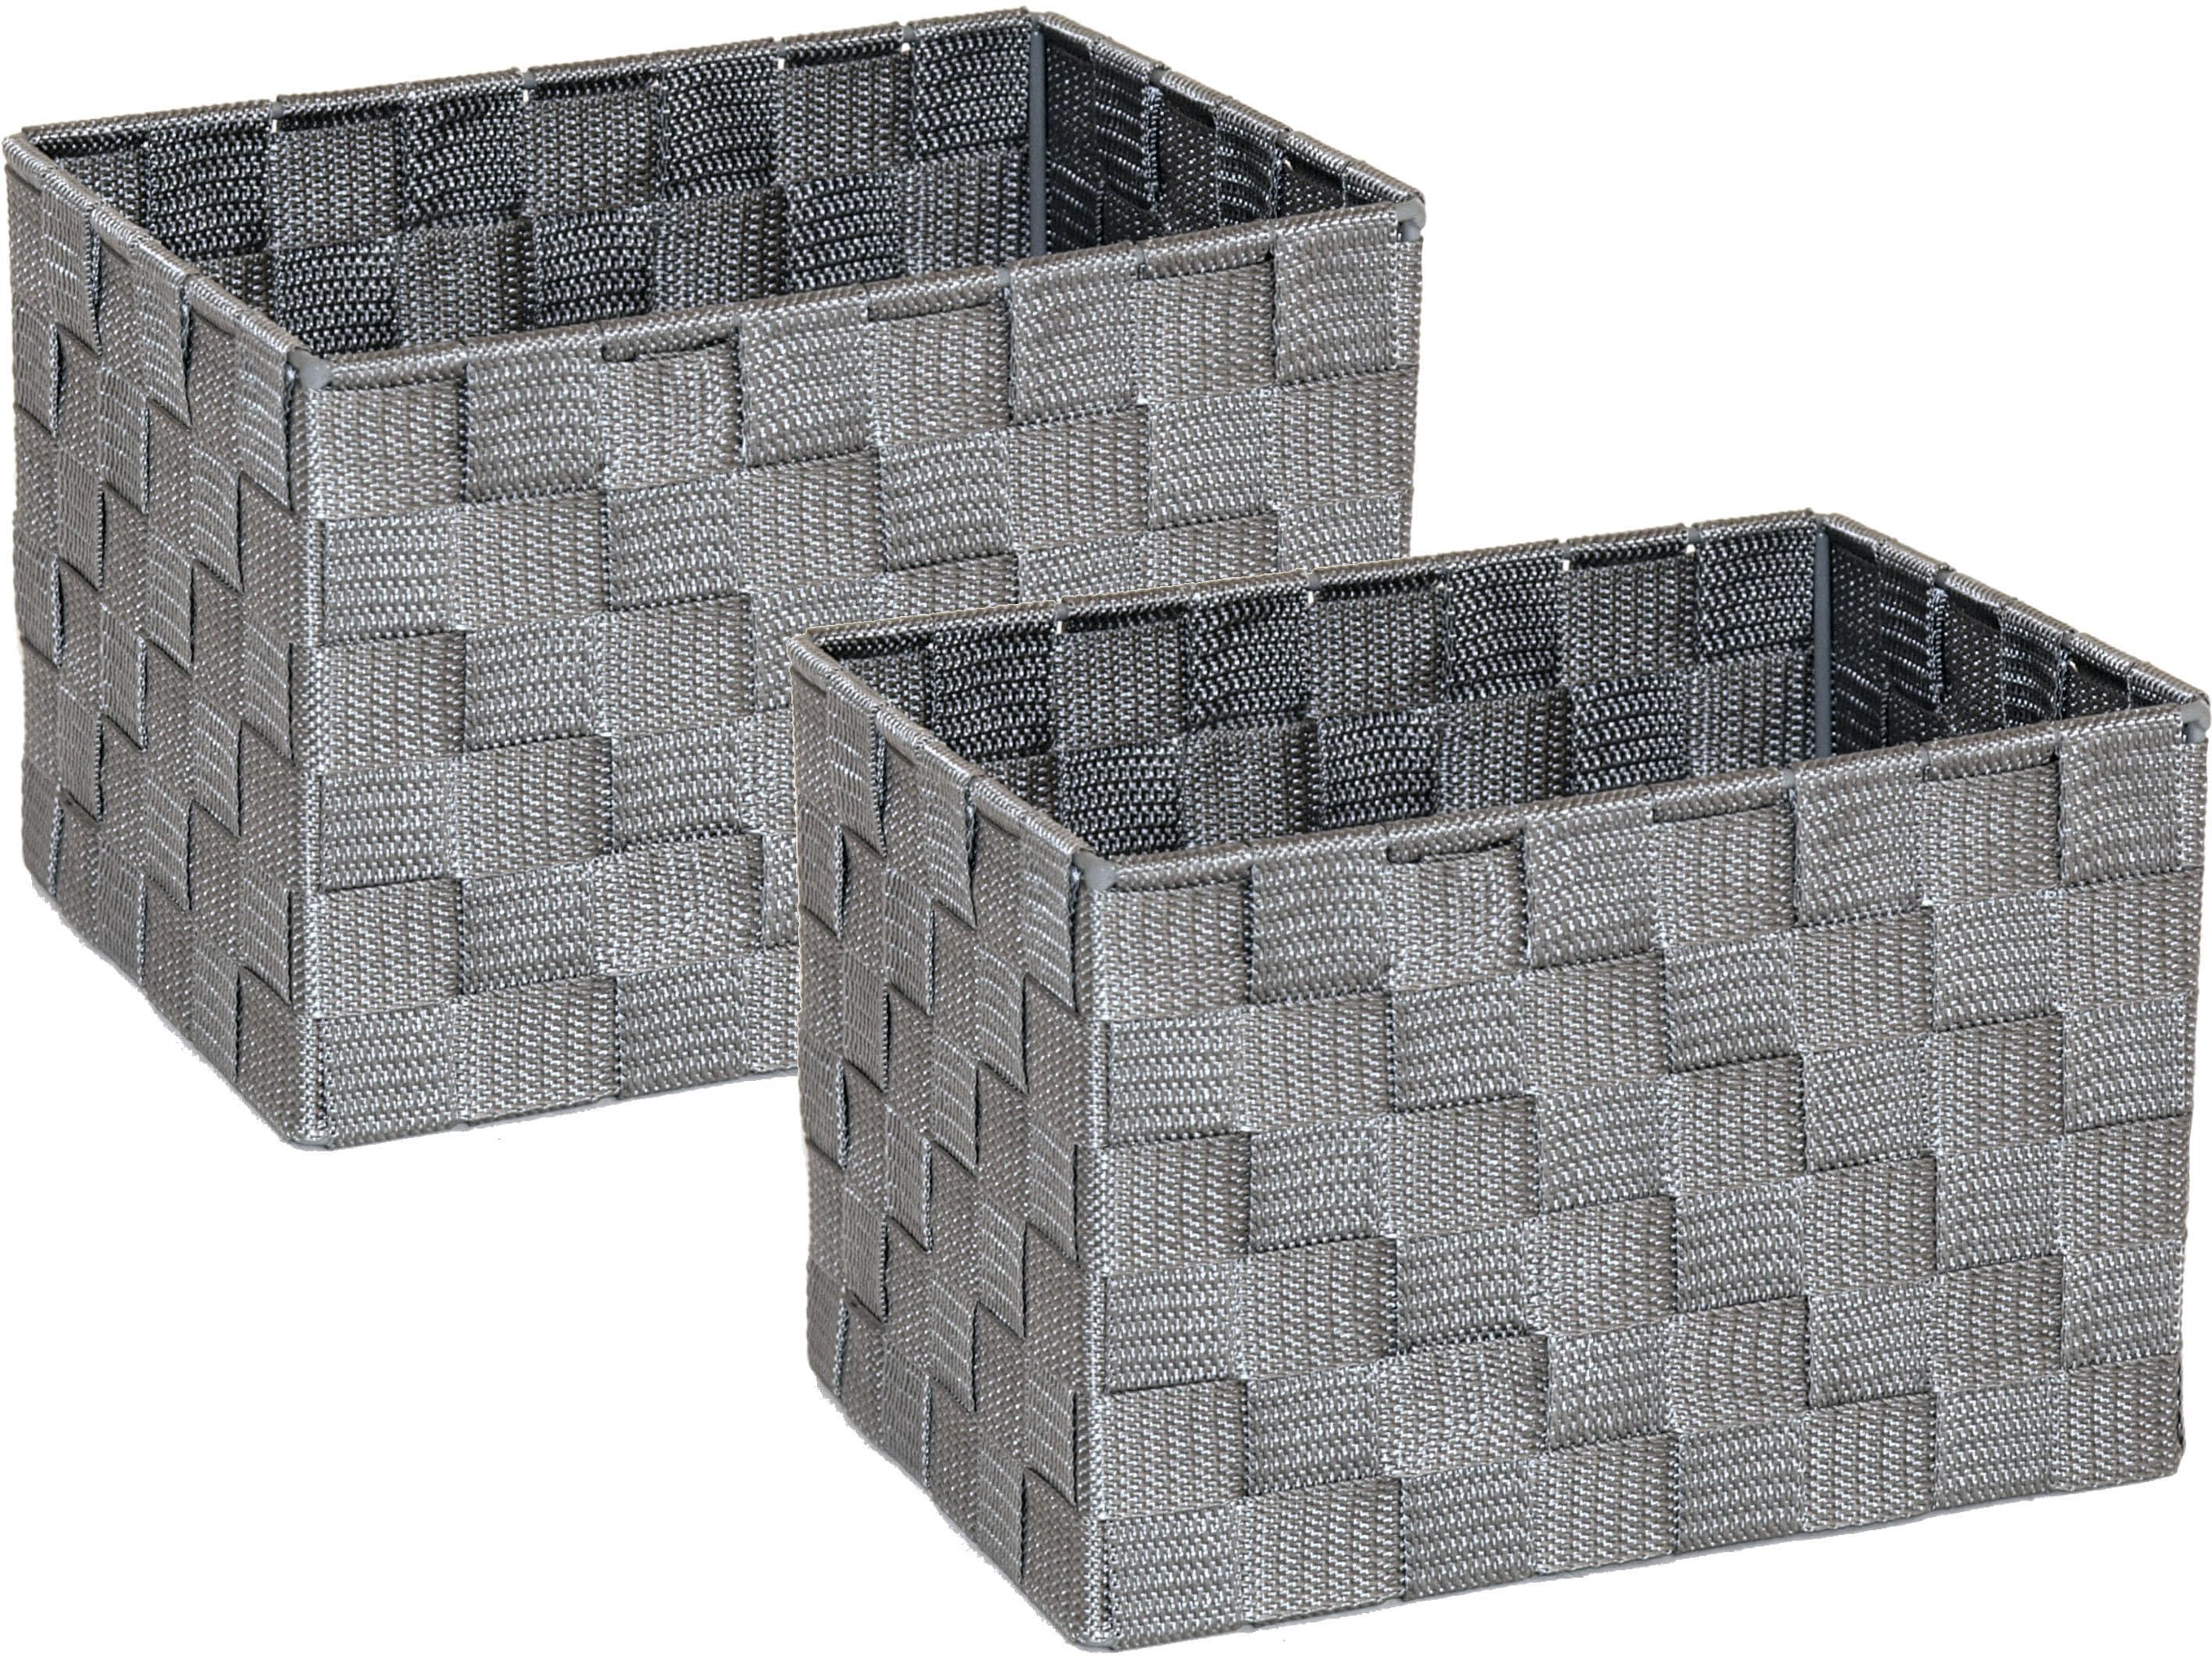 Franz Müller Flechtwaren Aufbewahrungsbox, (Set, 2 St.), Gr. 23 x 18 cm grau Kleideraufbewahrung Aufbewahrung Ordnung Wohnaccessoires Aufbewahrungsbox